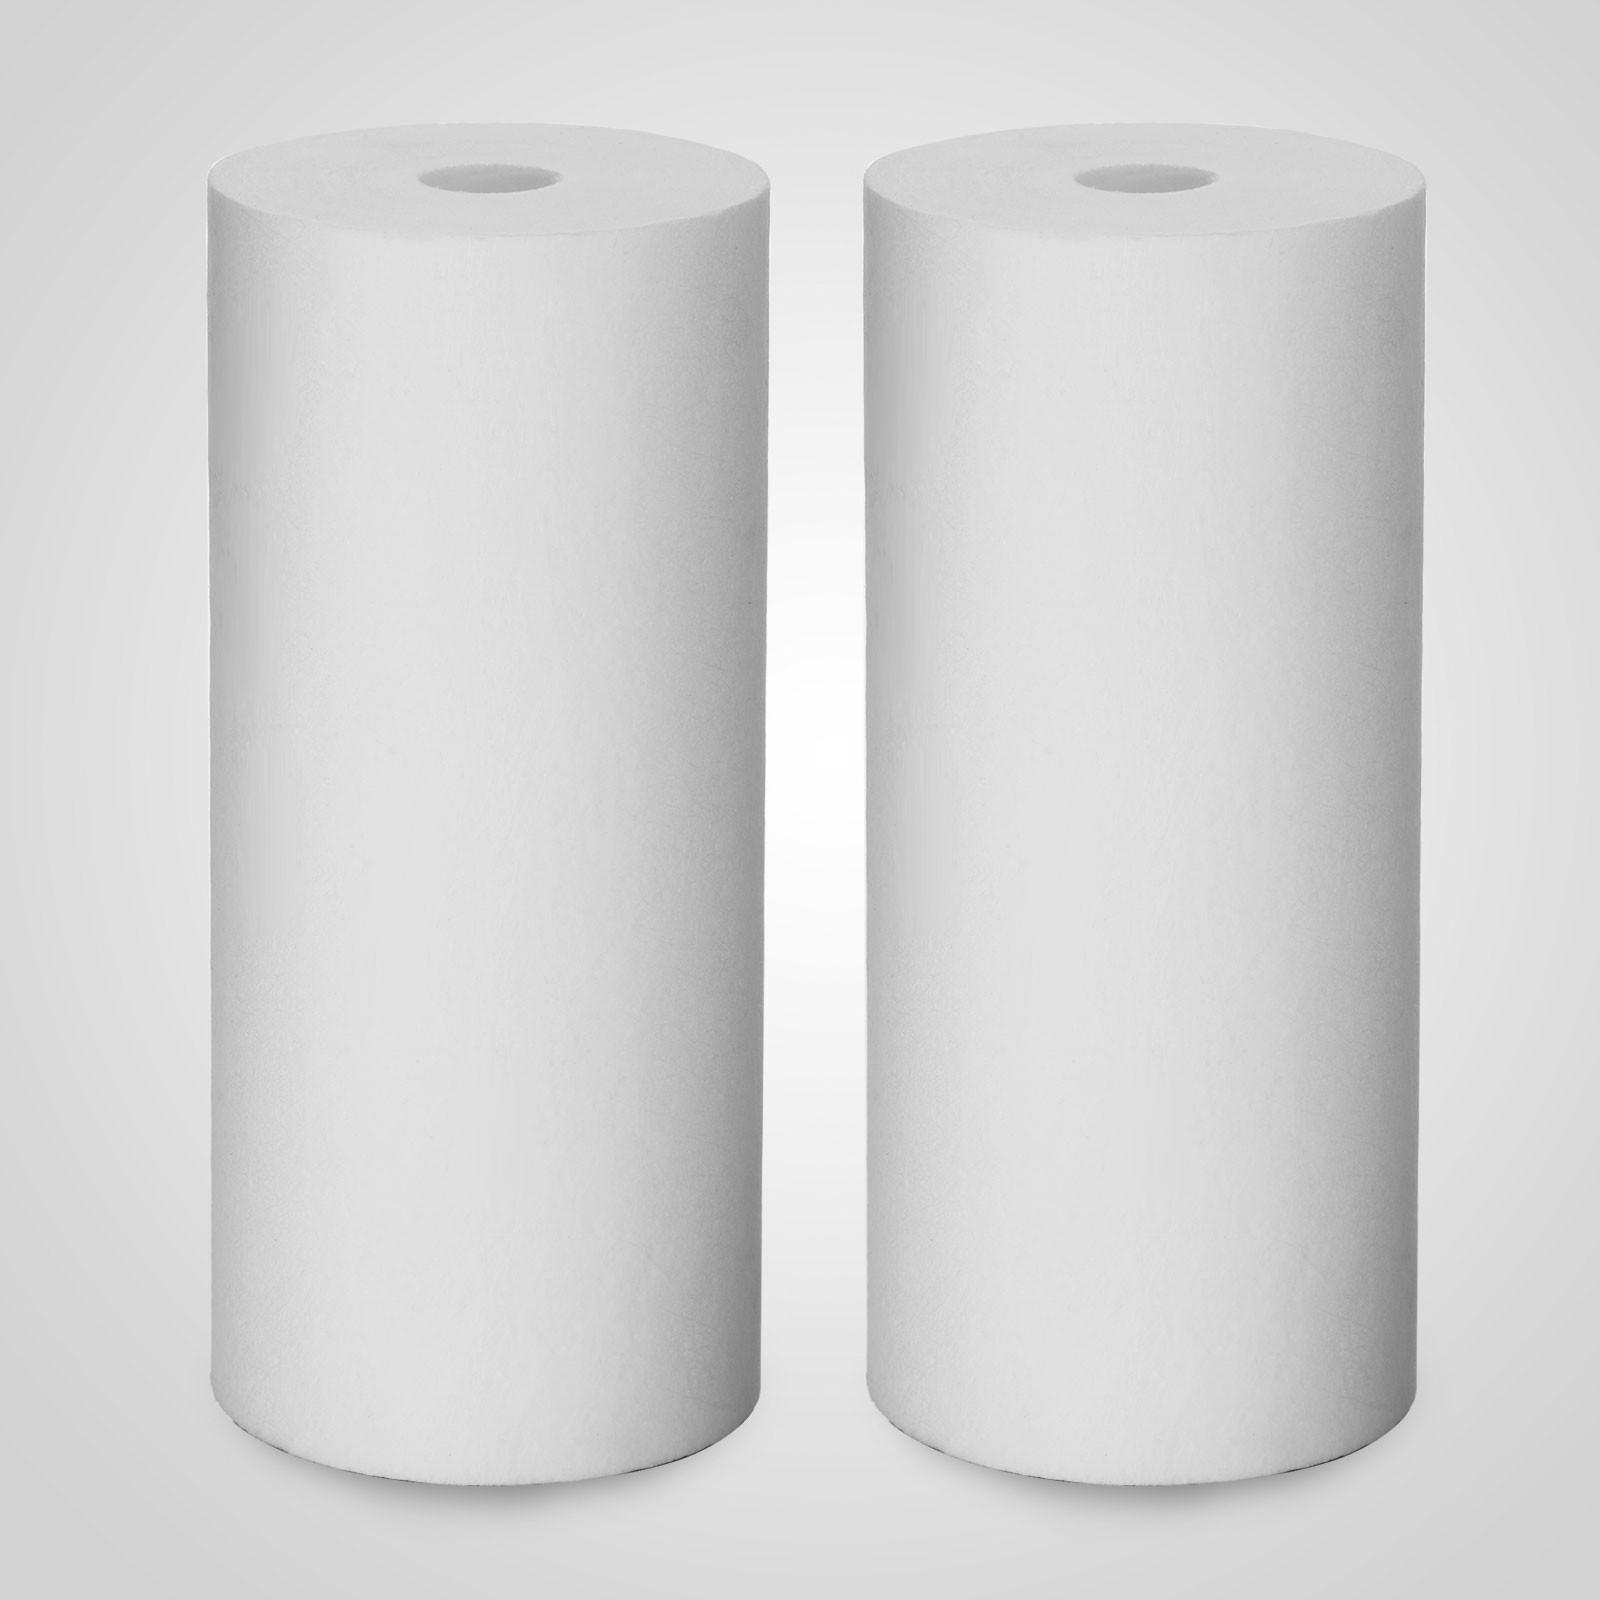 20Pcs-Cartouche-Filtre-a-eau-5-Micron-10-034-X-4-5-034-as-Brita-Bobine-Anti-boue miniature 11